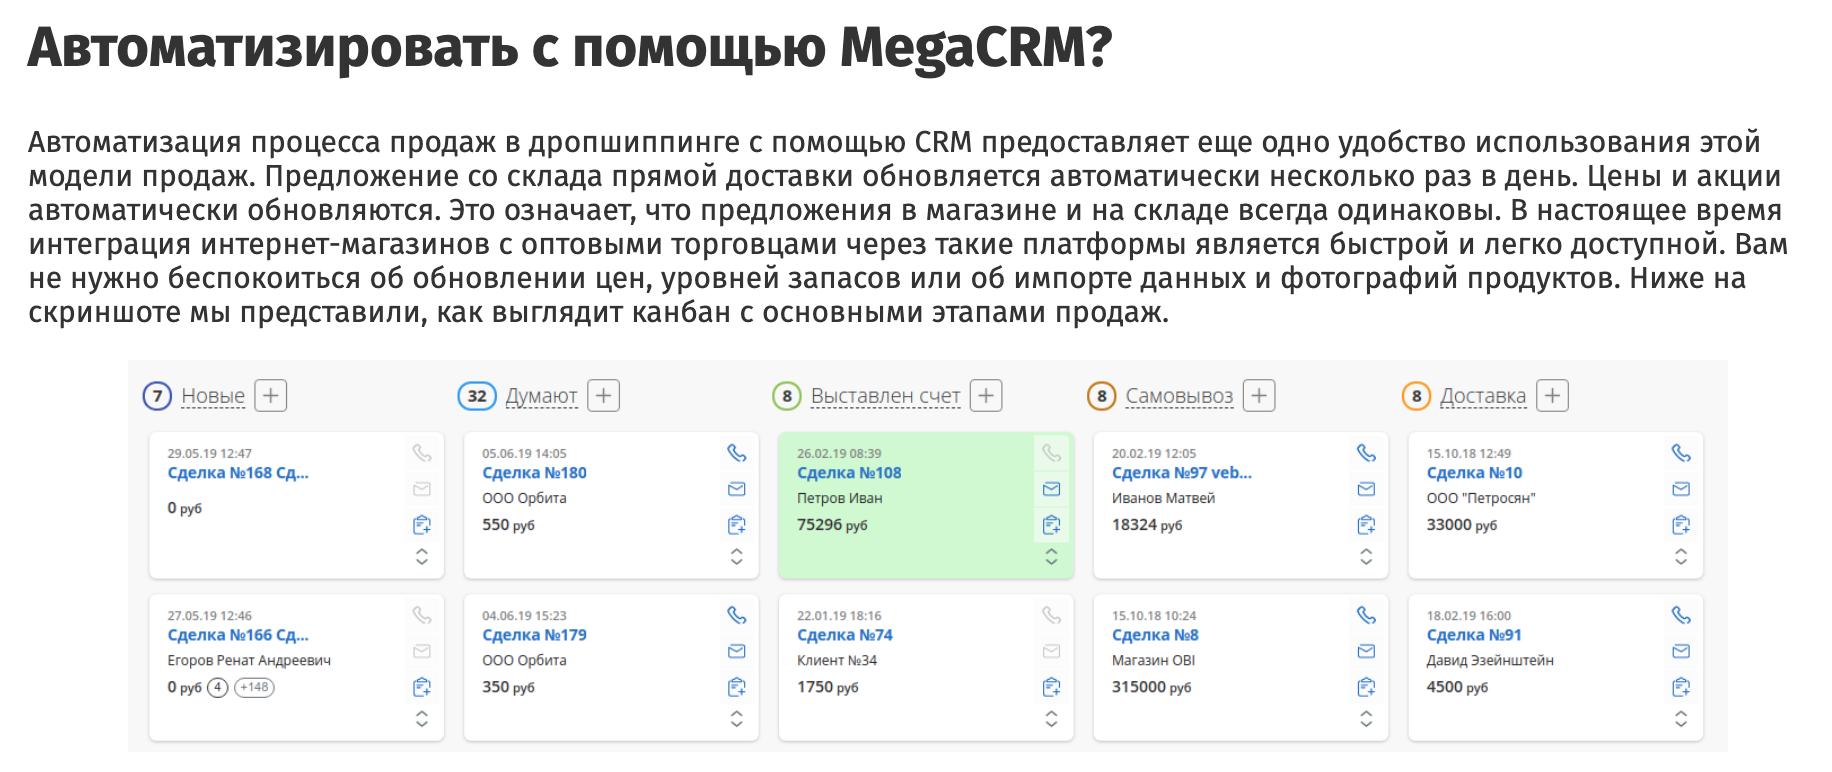 Система организации производства и снабжения по принципу «точно в срок» (канбан) от компании Megagroup